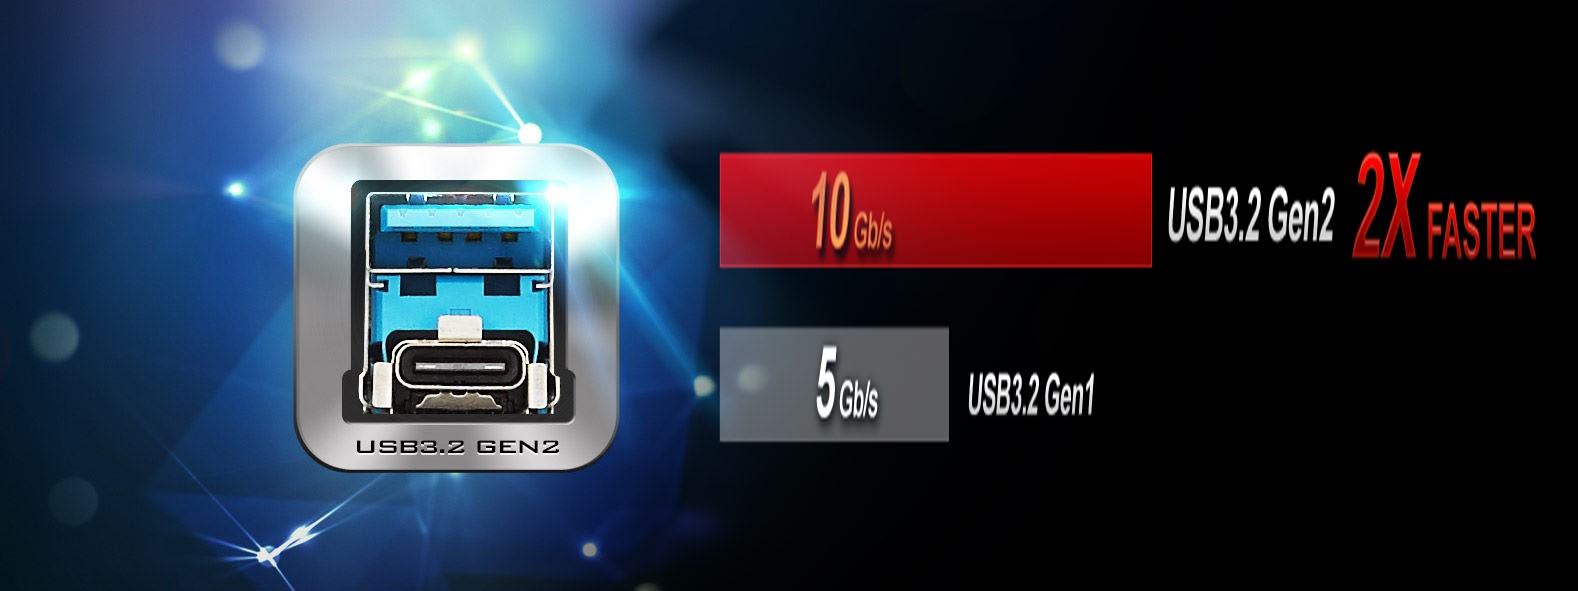 Dual USB 3.2 Gen2 (Type-A + Type-C)